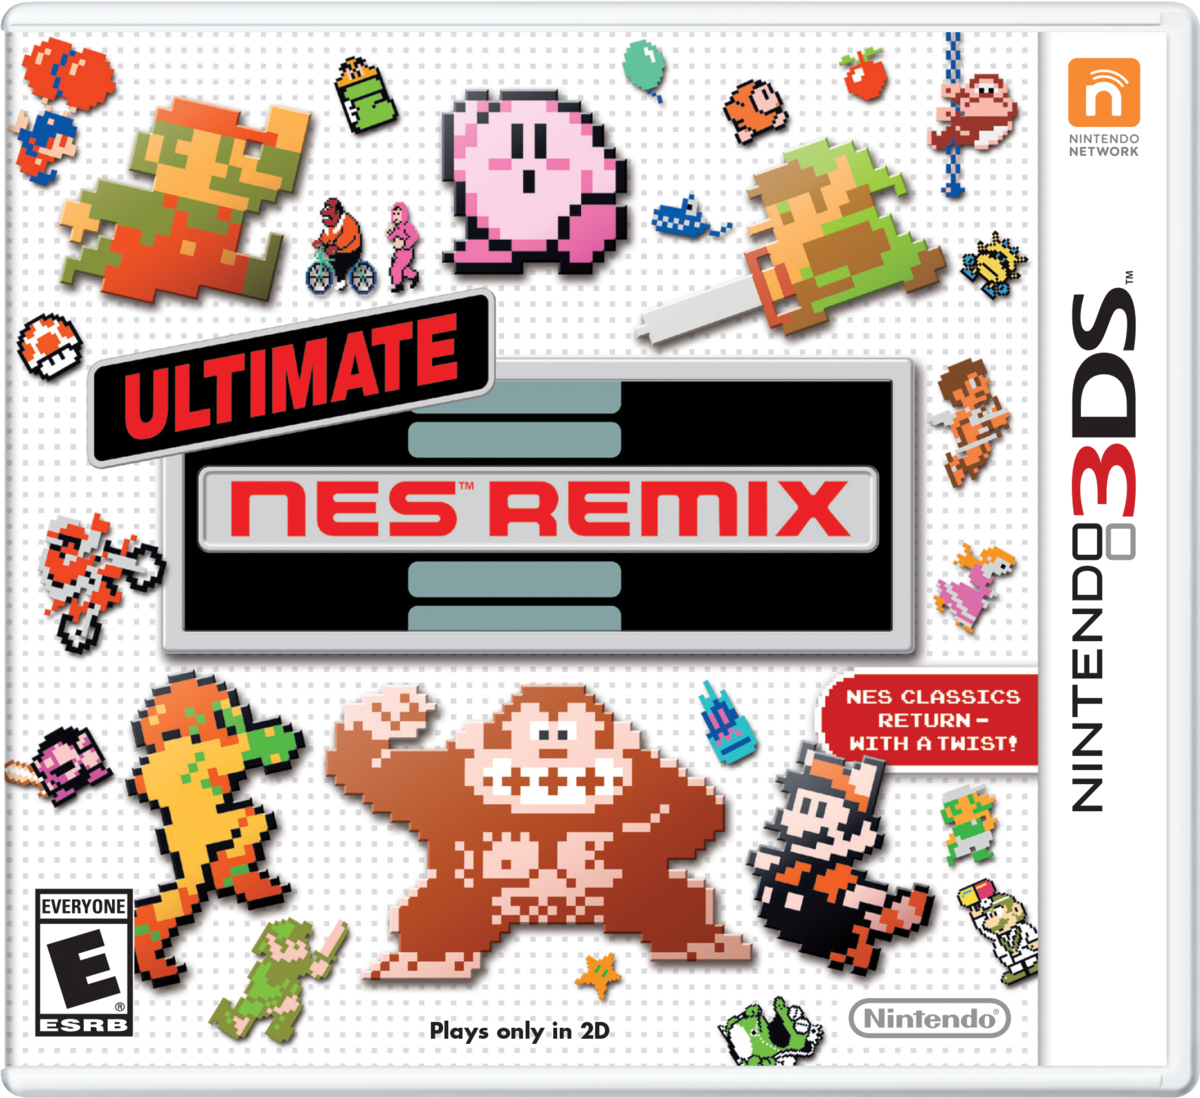 Ultimate NES Remix - Super Mario Wiki, the Mario encyclopedia